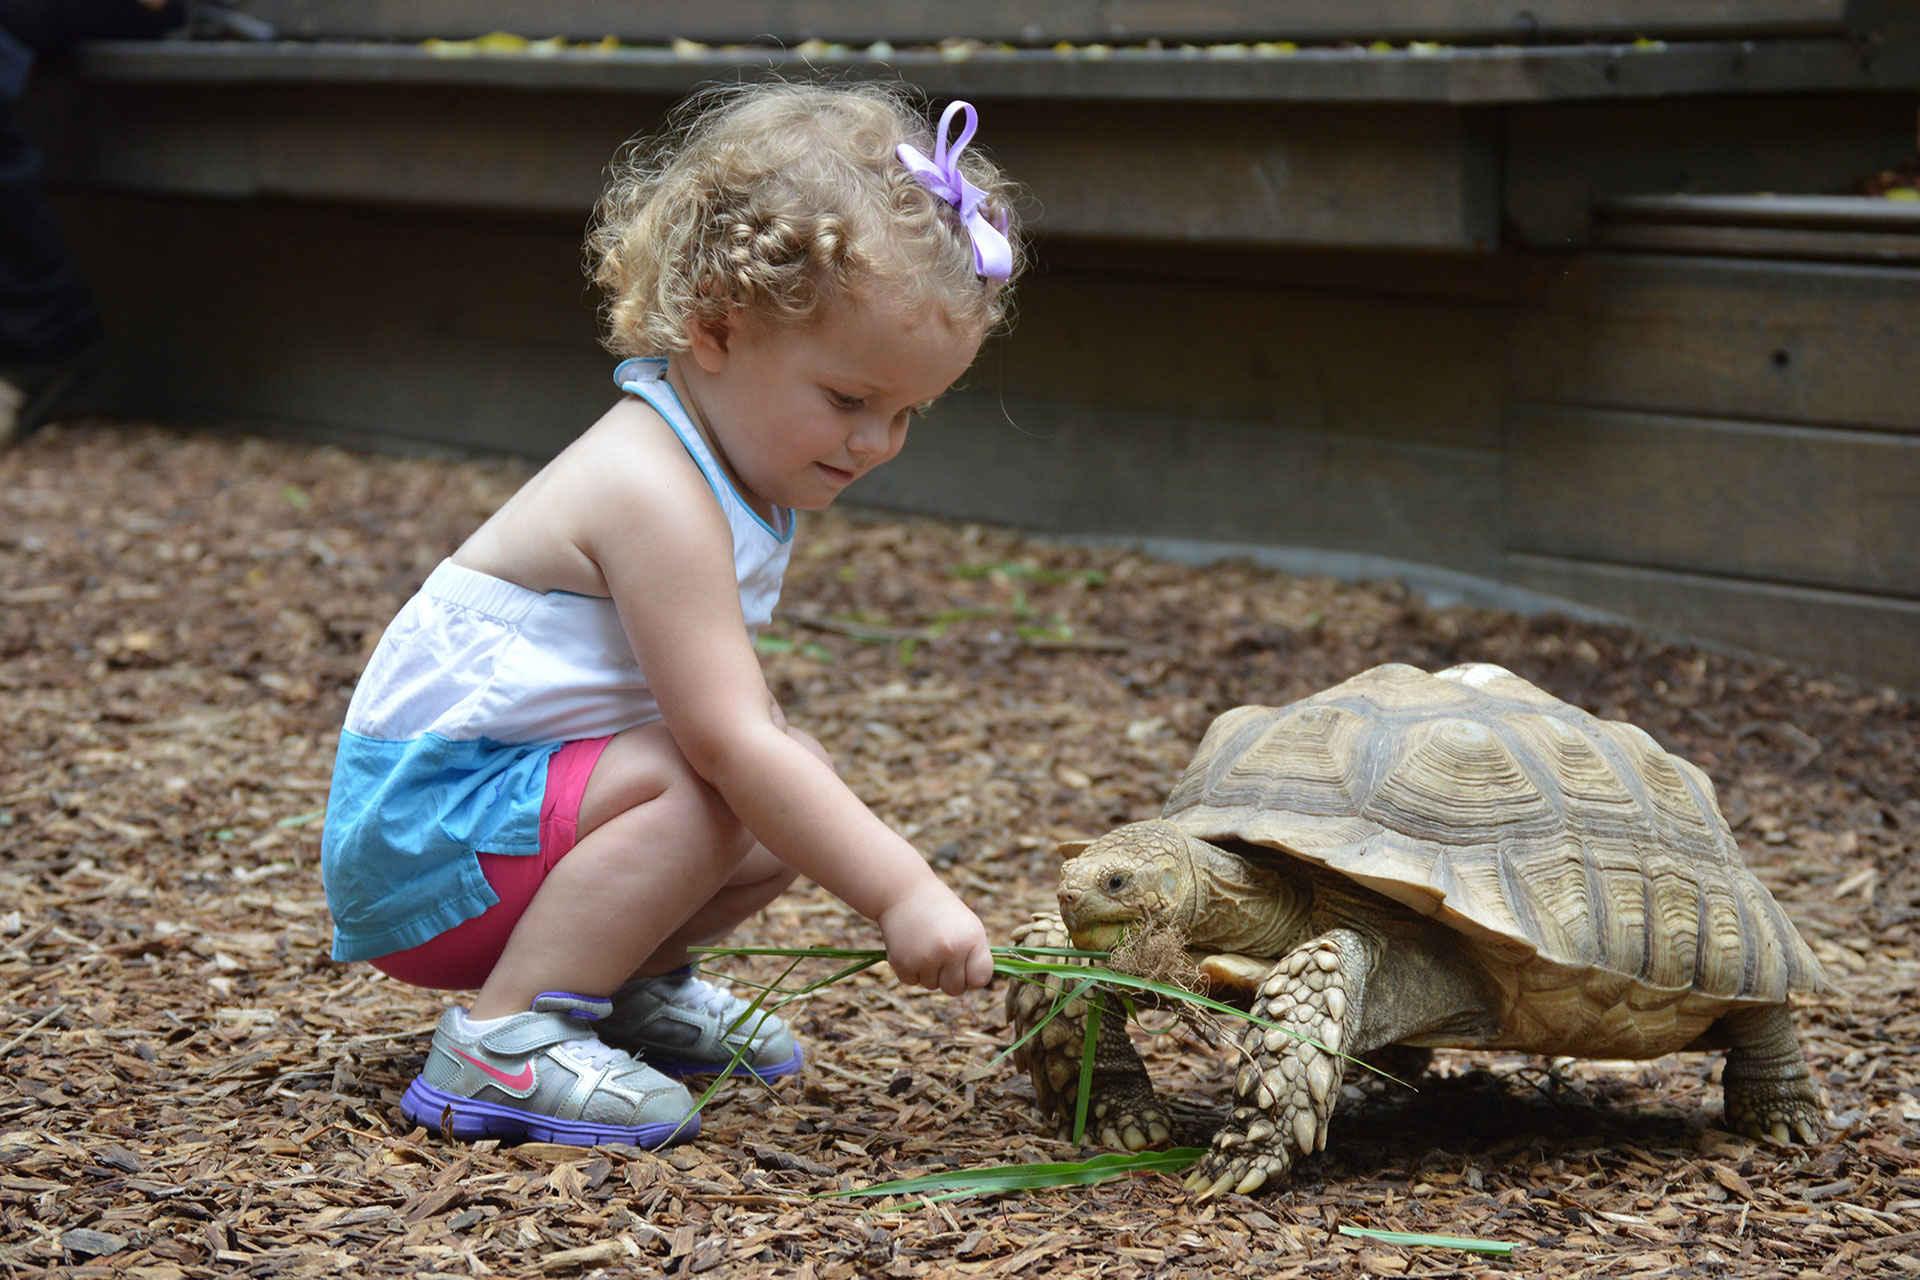 Little Girl Feeding Turtle at Nashville Zoo; Courtesy of Samantha Currington/Nashville Convention & Visitors Corp.